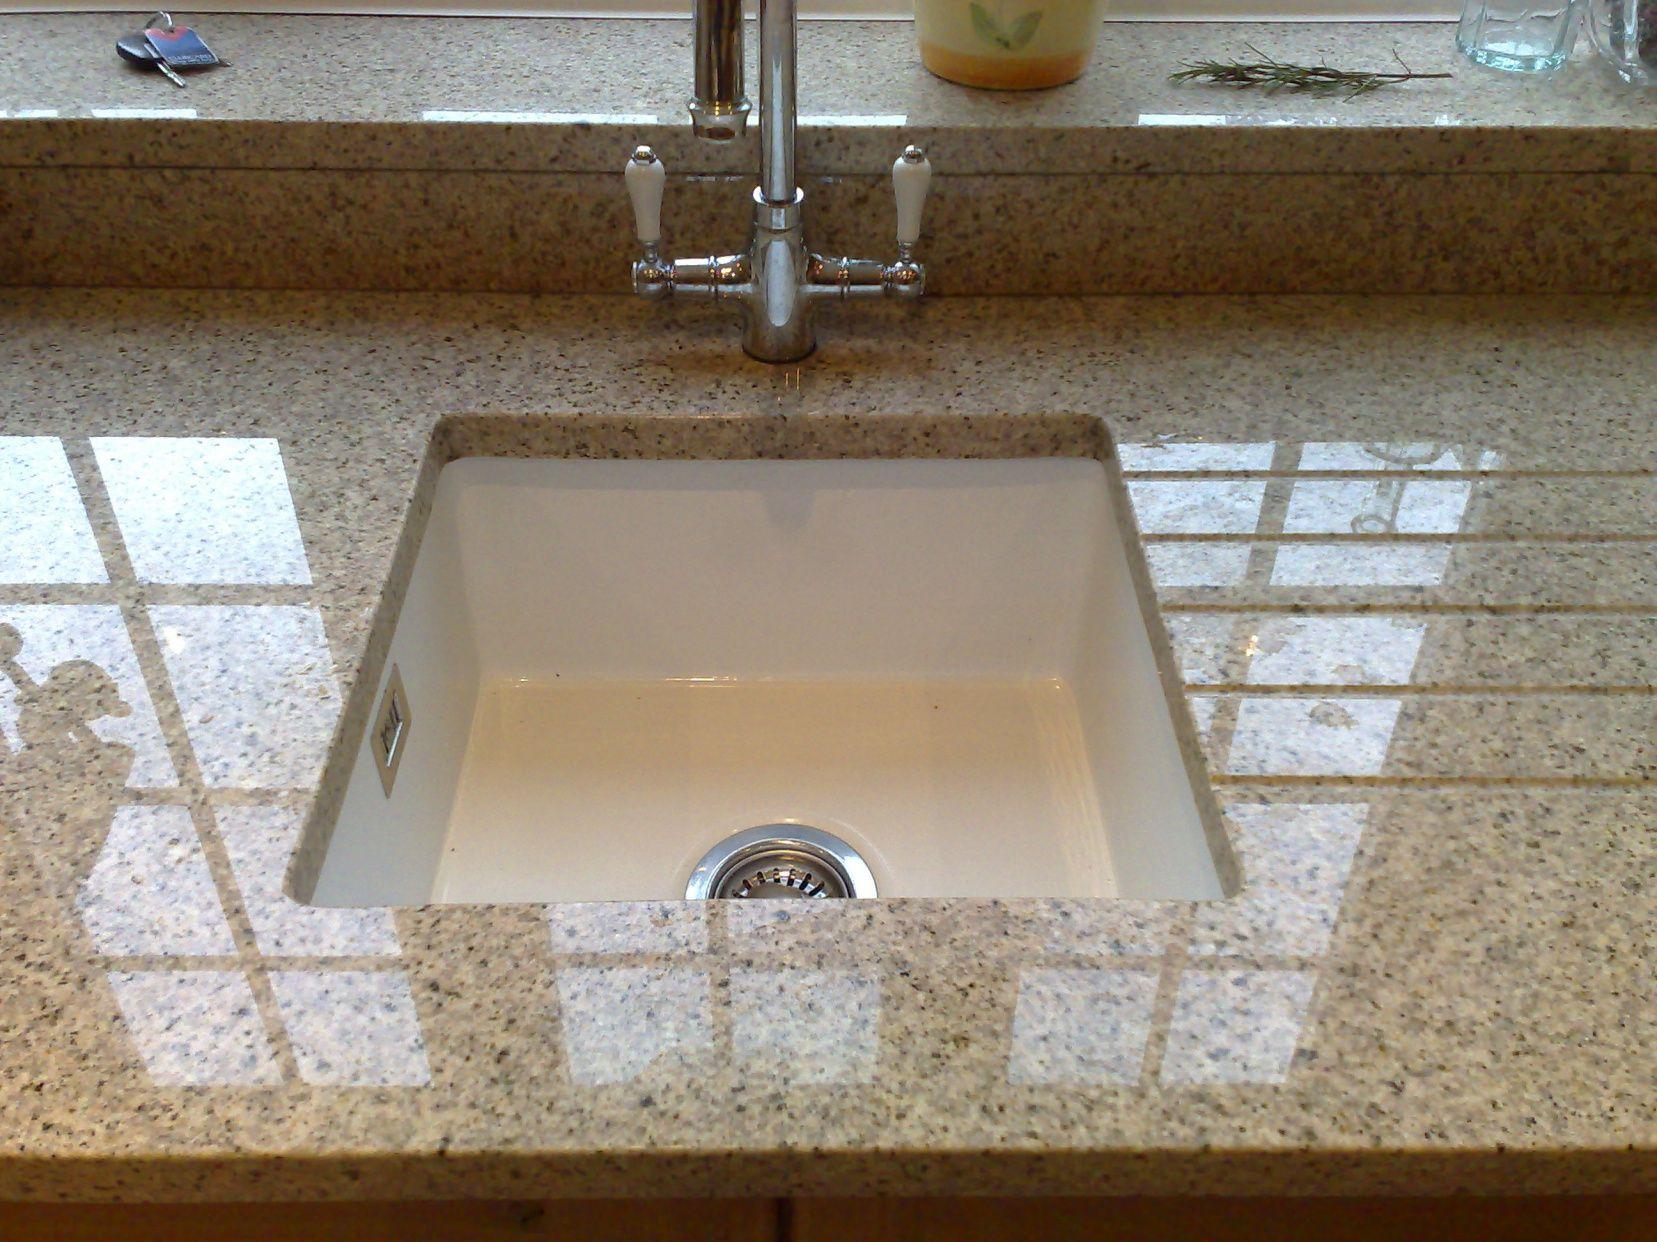 99 How To Install Undermount Sink On Granite Countertop Kitchen Cabinets Storage Ide Kitchen Decor Modern Stainless Steel Kitchen Faucet Large Kitchen Sinks